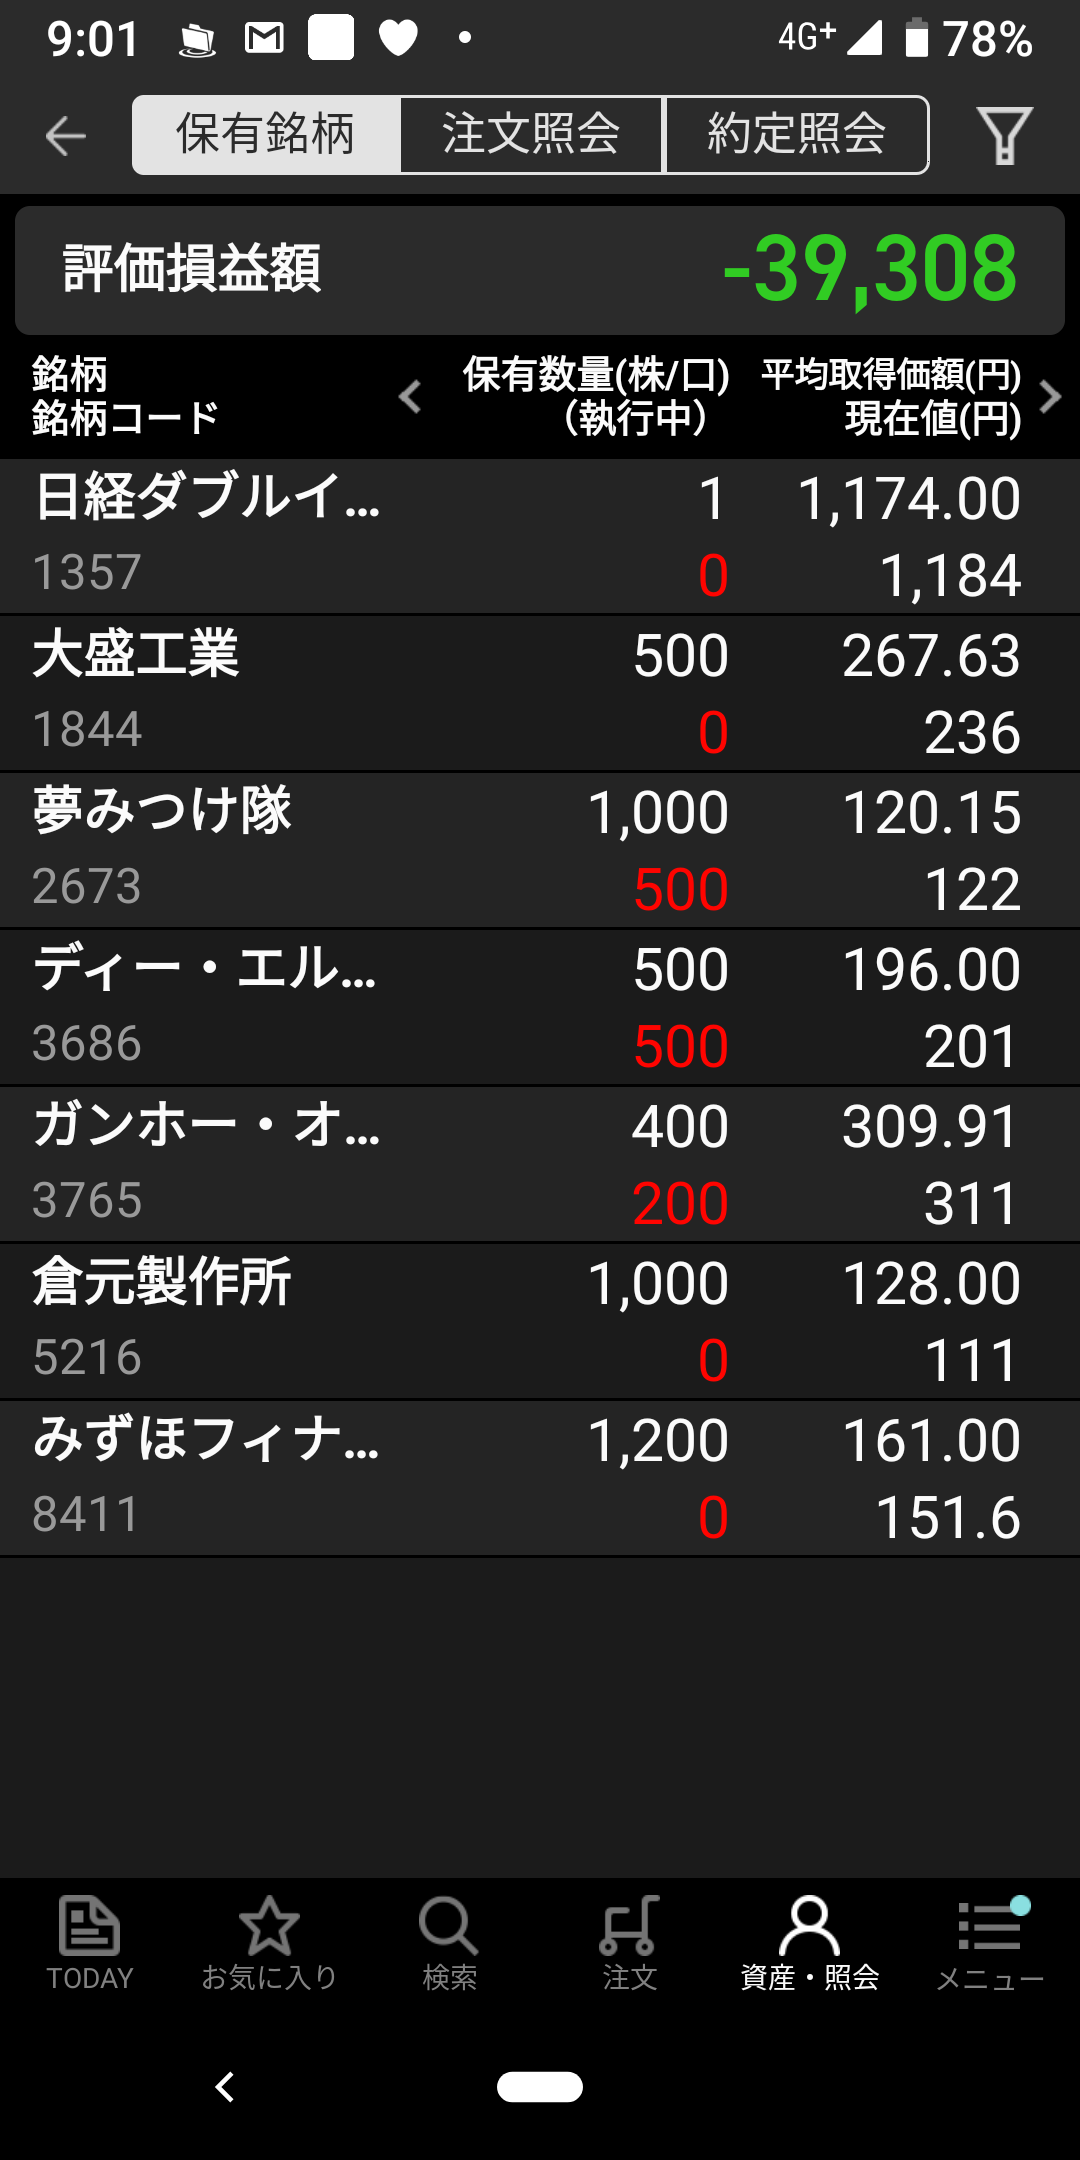 Screenshot (2019_06_17 9_01_52)